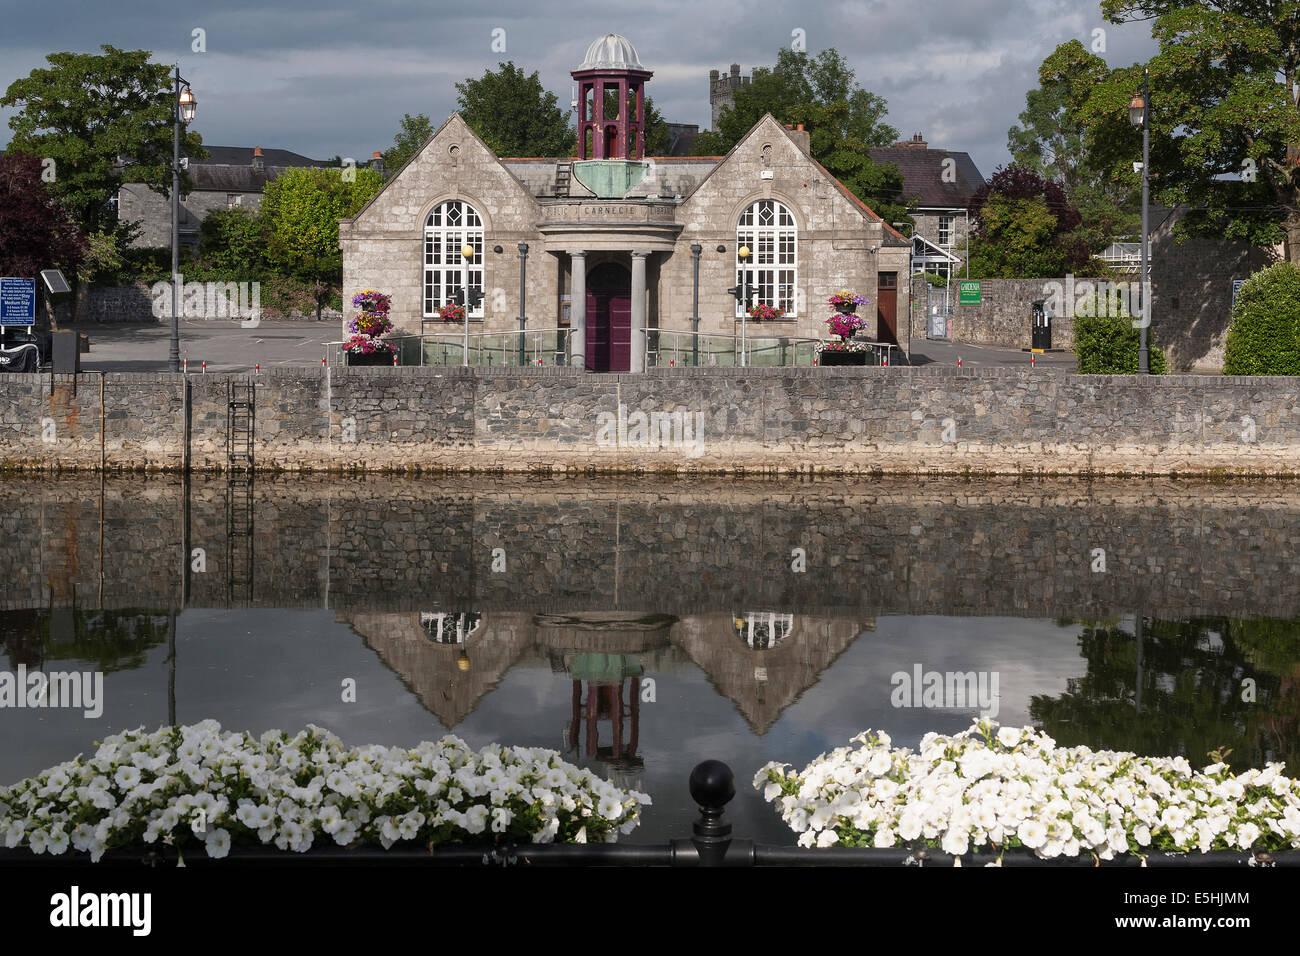 Ireland, County Kilkenny, Kilkenny Public Library & River Nore - Stock Image